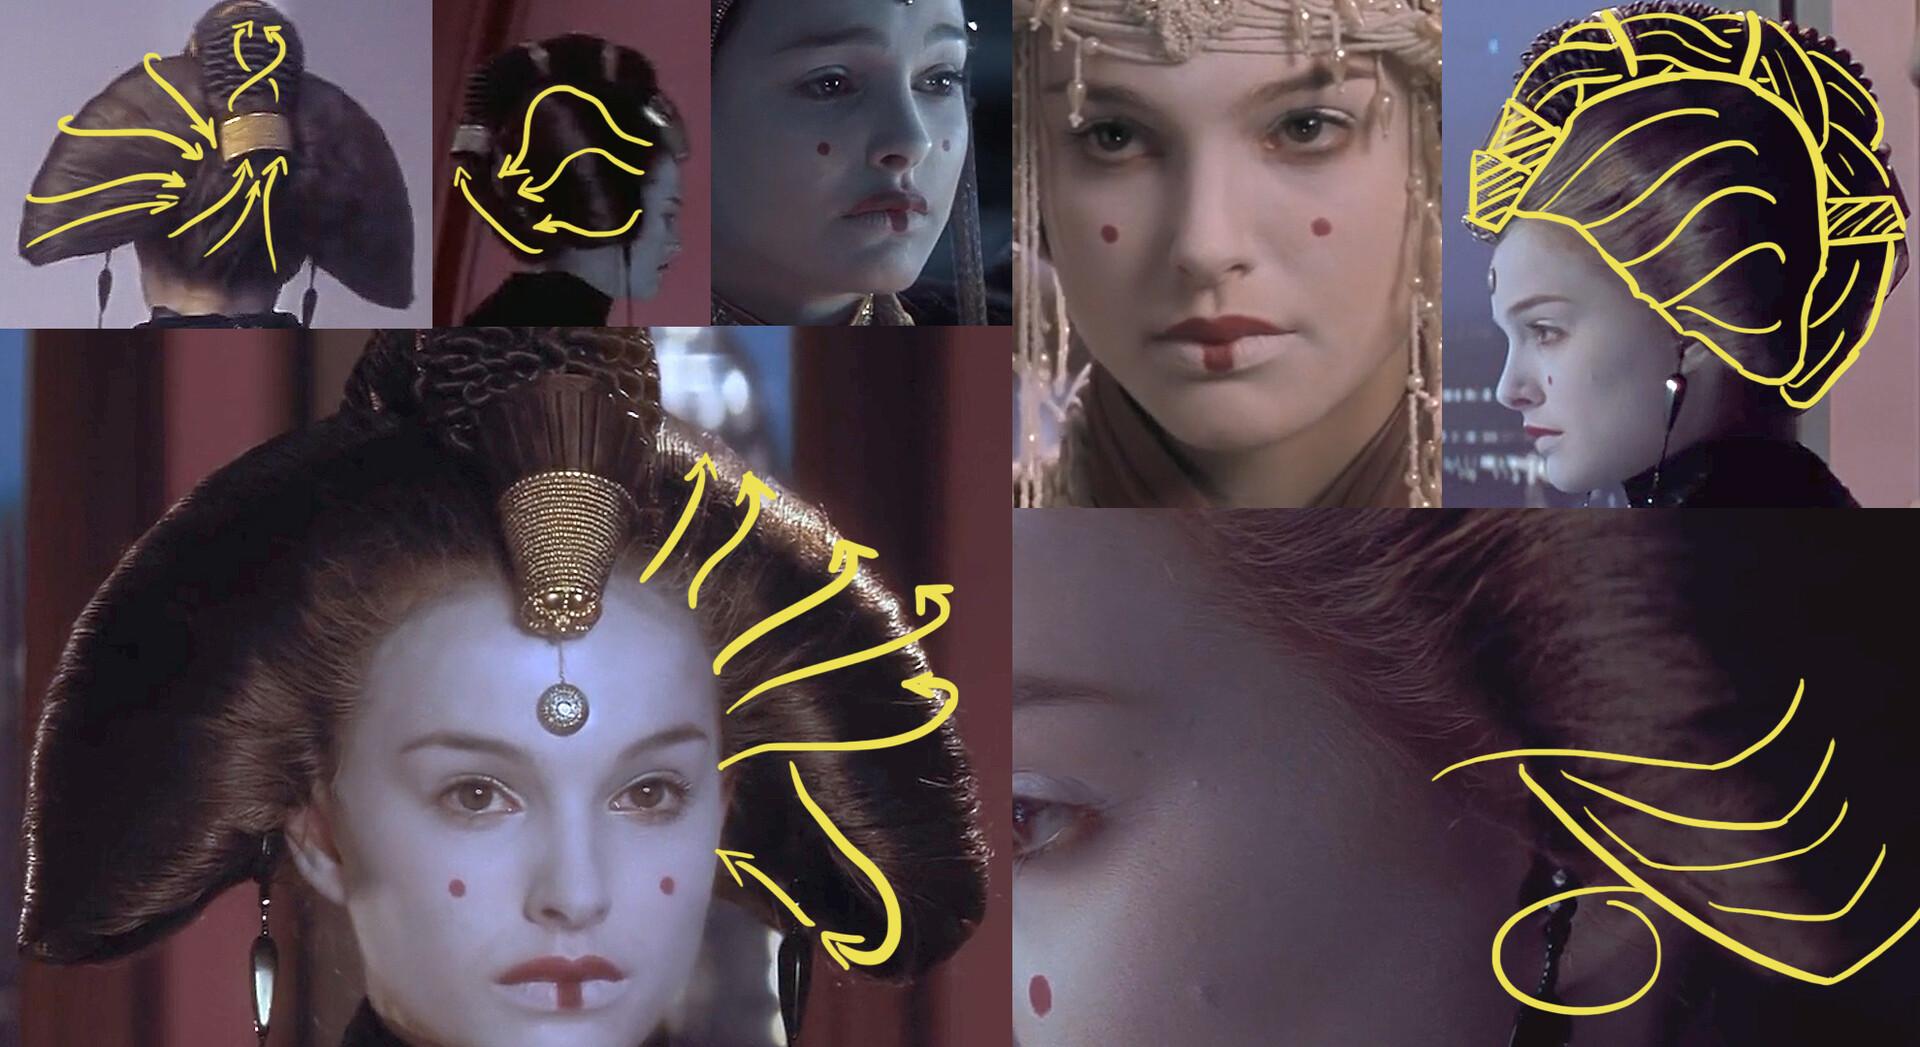 Hair reference; based on Amidala's Phantom menace pre-senate appearance.